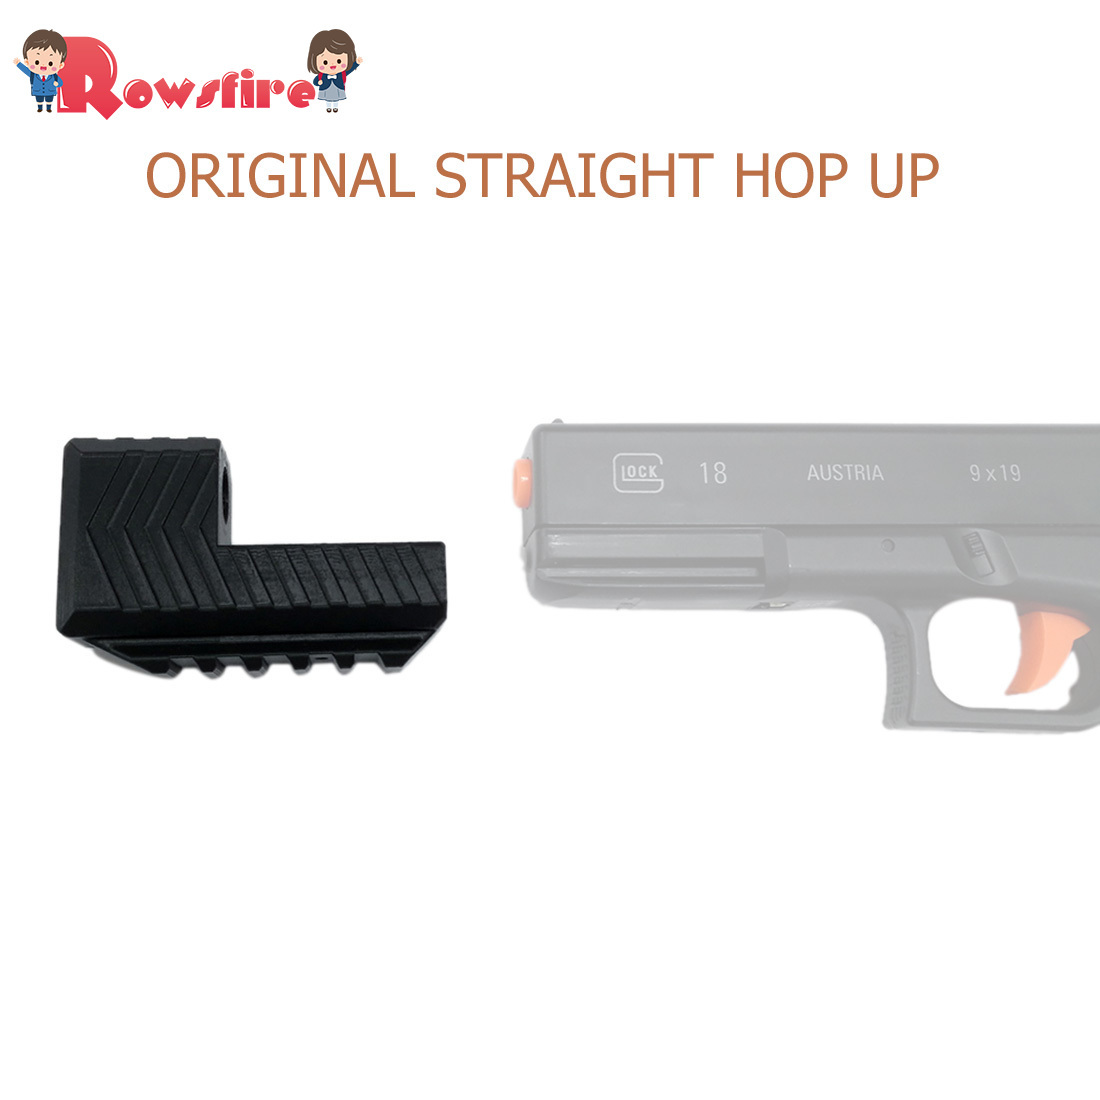 Original Straight Hop Up For SKD Glock G18 Water Gel Beads Blaster - Black